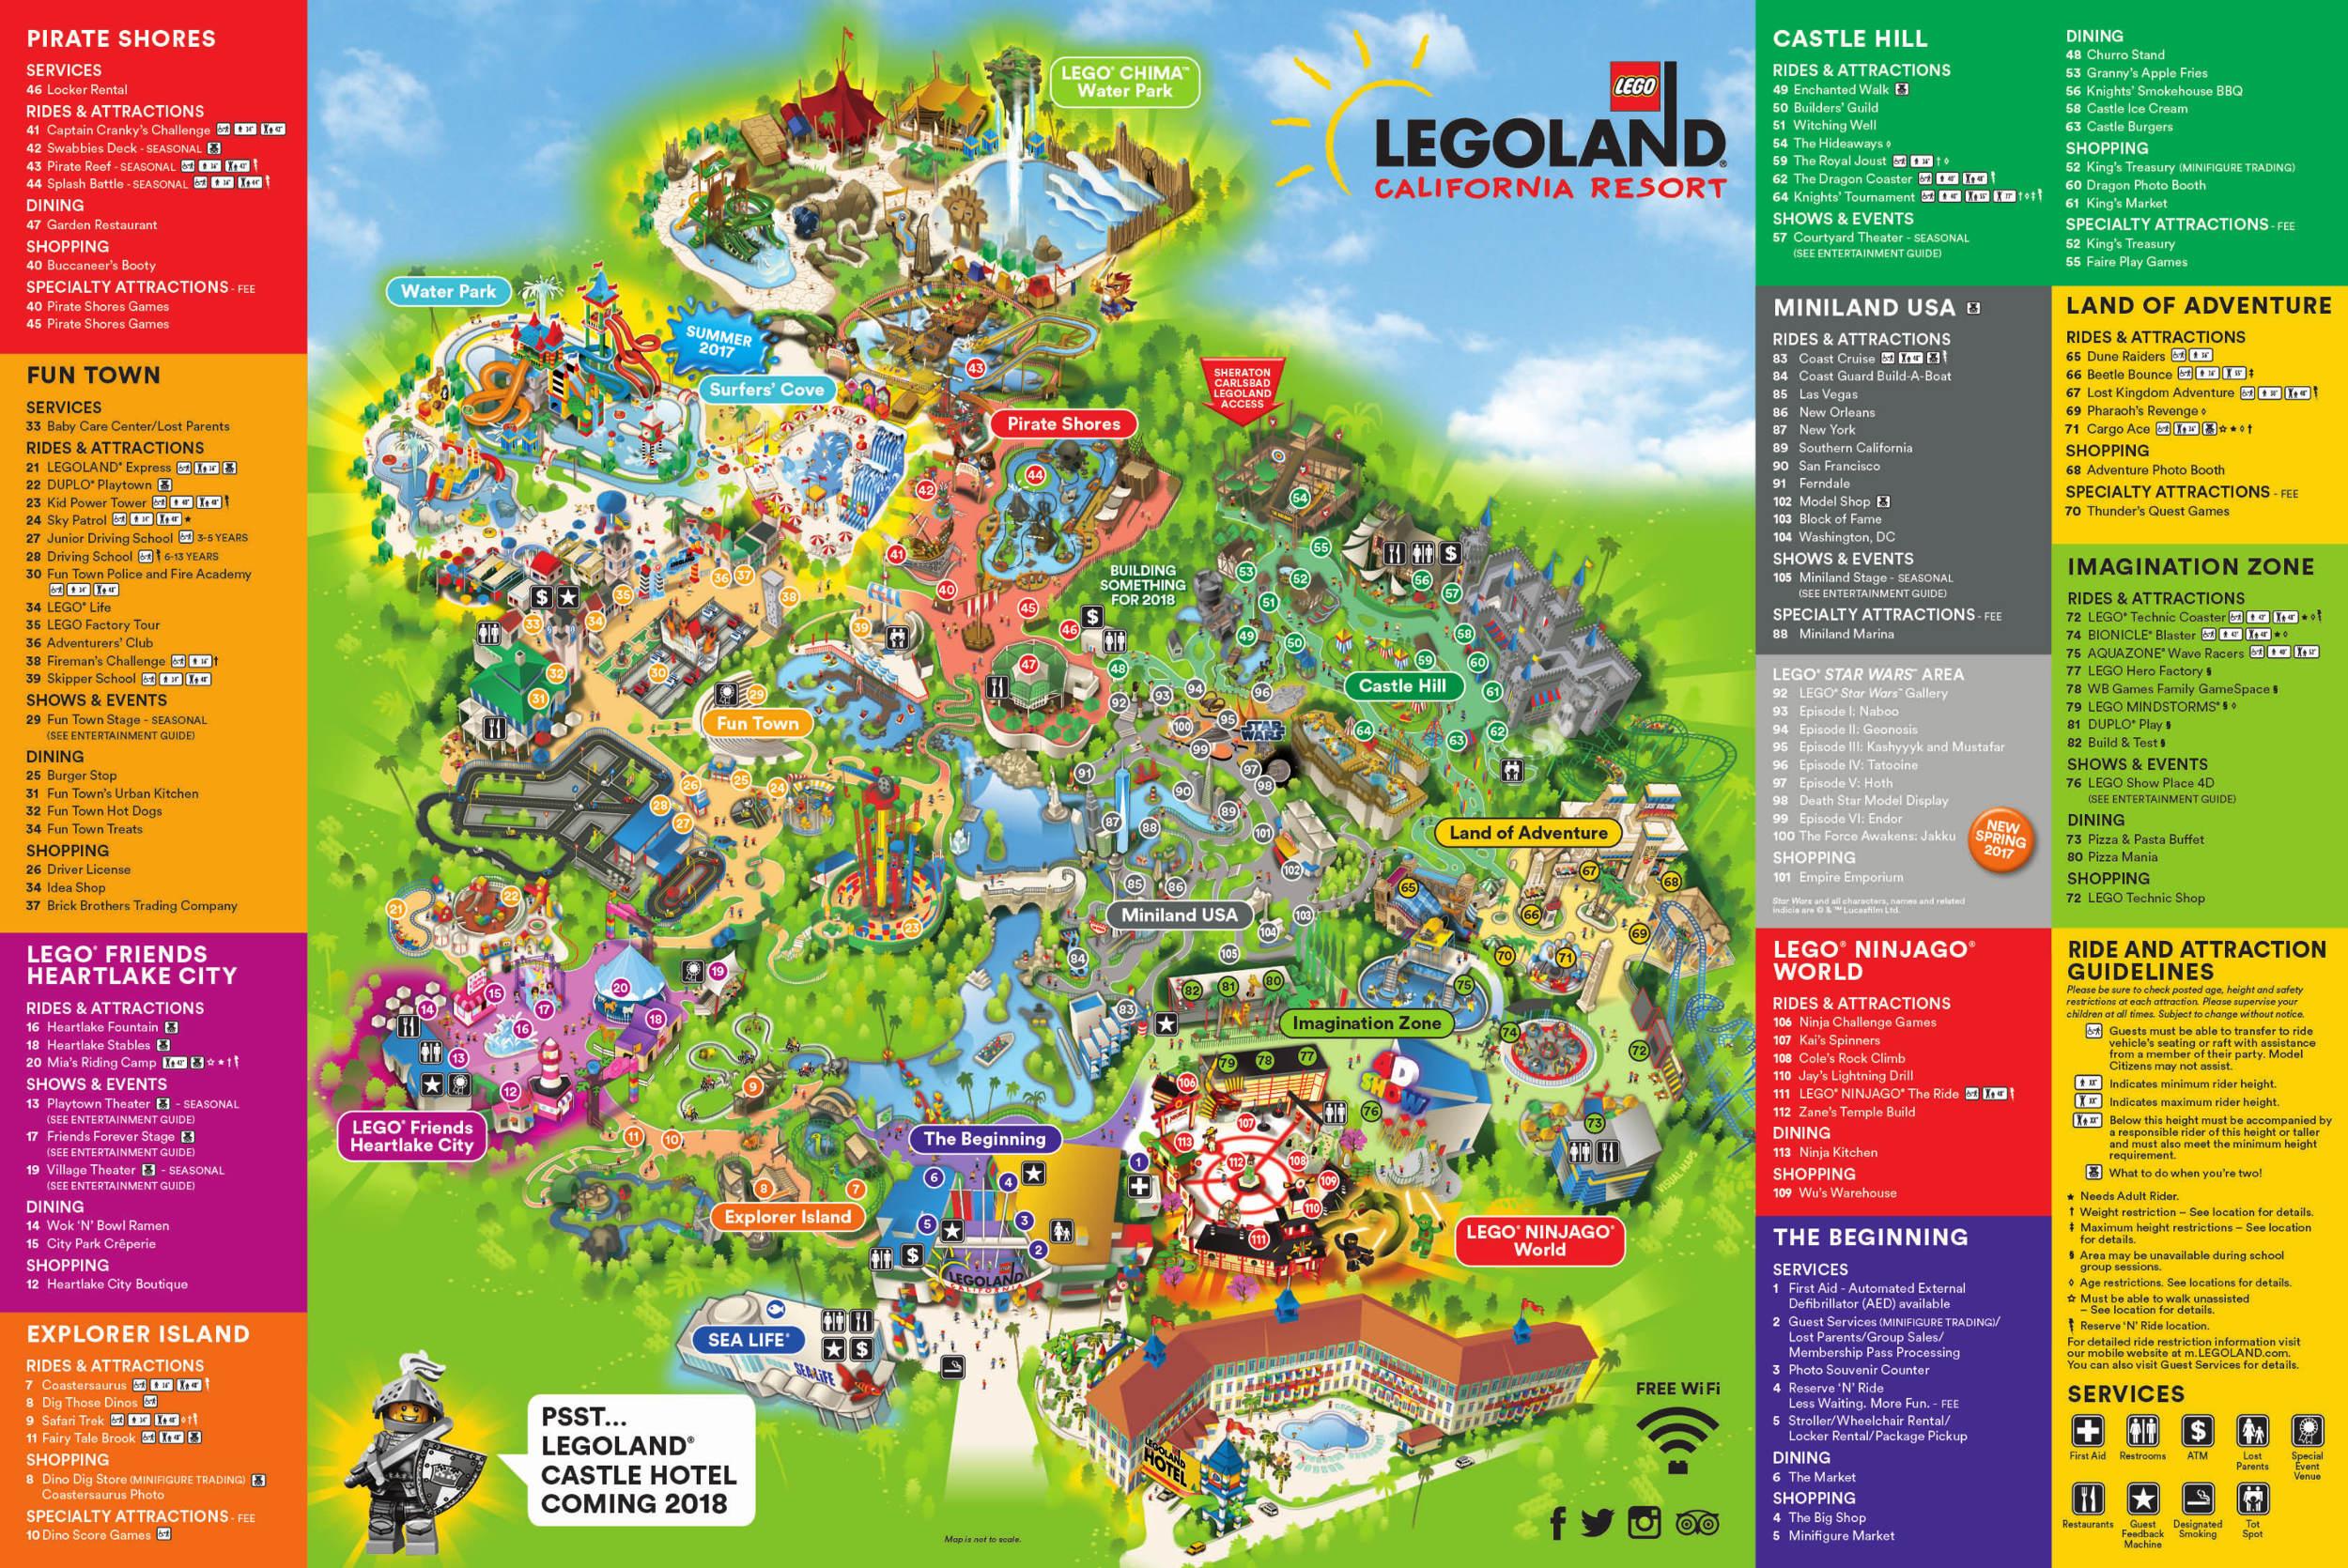 Google Maps Legoland California - Klipy - Southern California Theme Parks Map